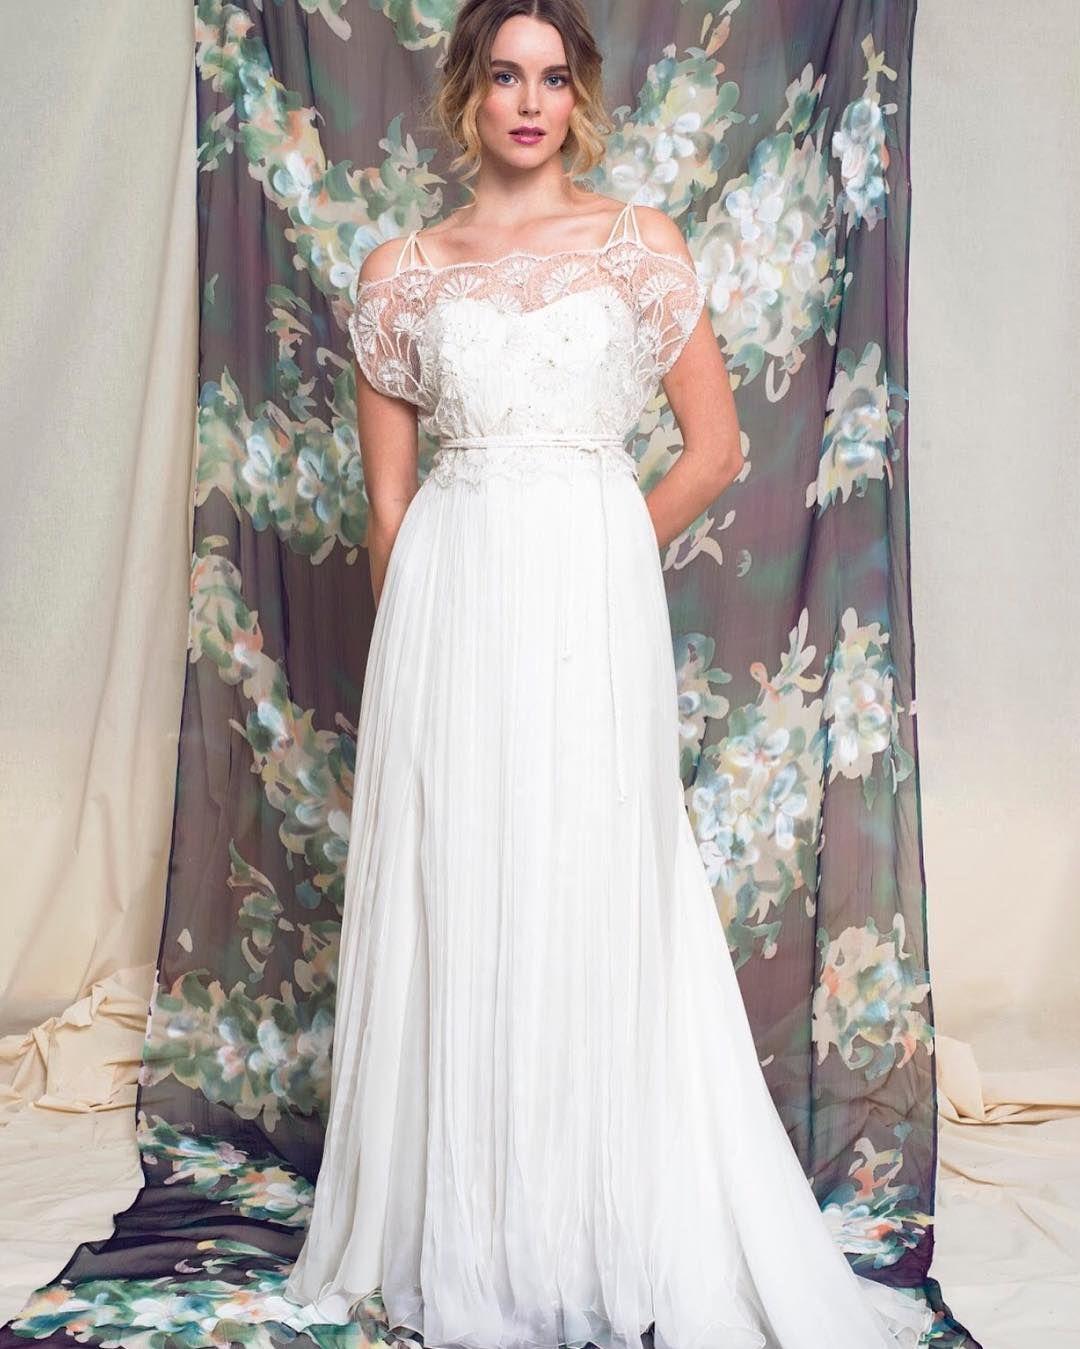 B O H OB R I D E  Chiffon base dress (13.000 kr) & Alisa top (6.000 kr) #ceciliemelli #ceciliemellibride #brud #bryllup #brudekjole #bride #wedding #weddingdress #bohobride #handmadeinoslo #norwegiandesign #summerbride  For å booke din prøvetime gratis og uforpliktende ta kontakt med @ceciliemellistudio:  45 48 06 26 by ceciliemellishop